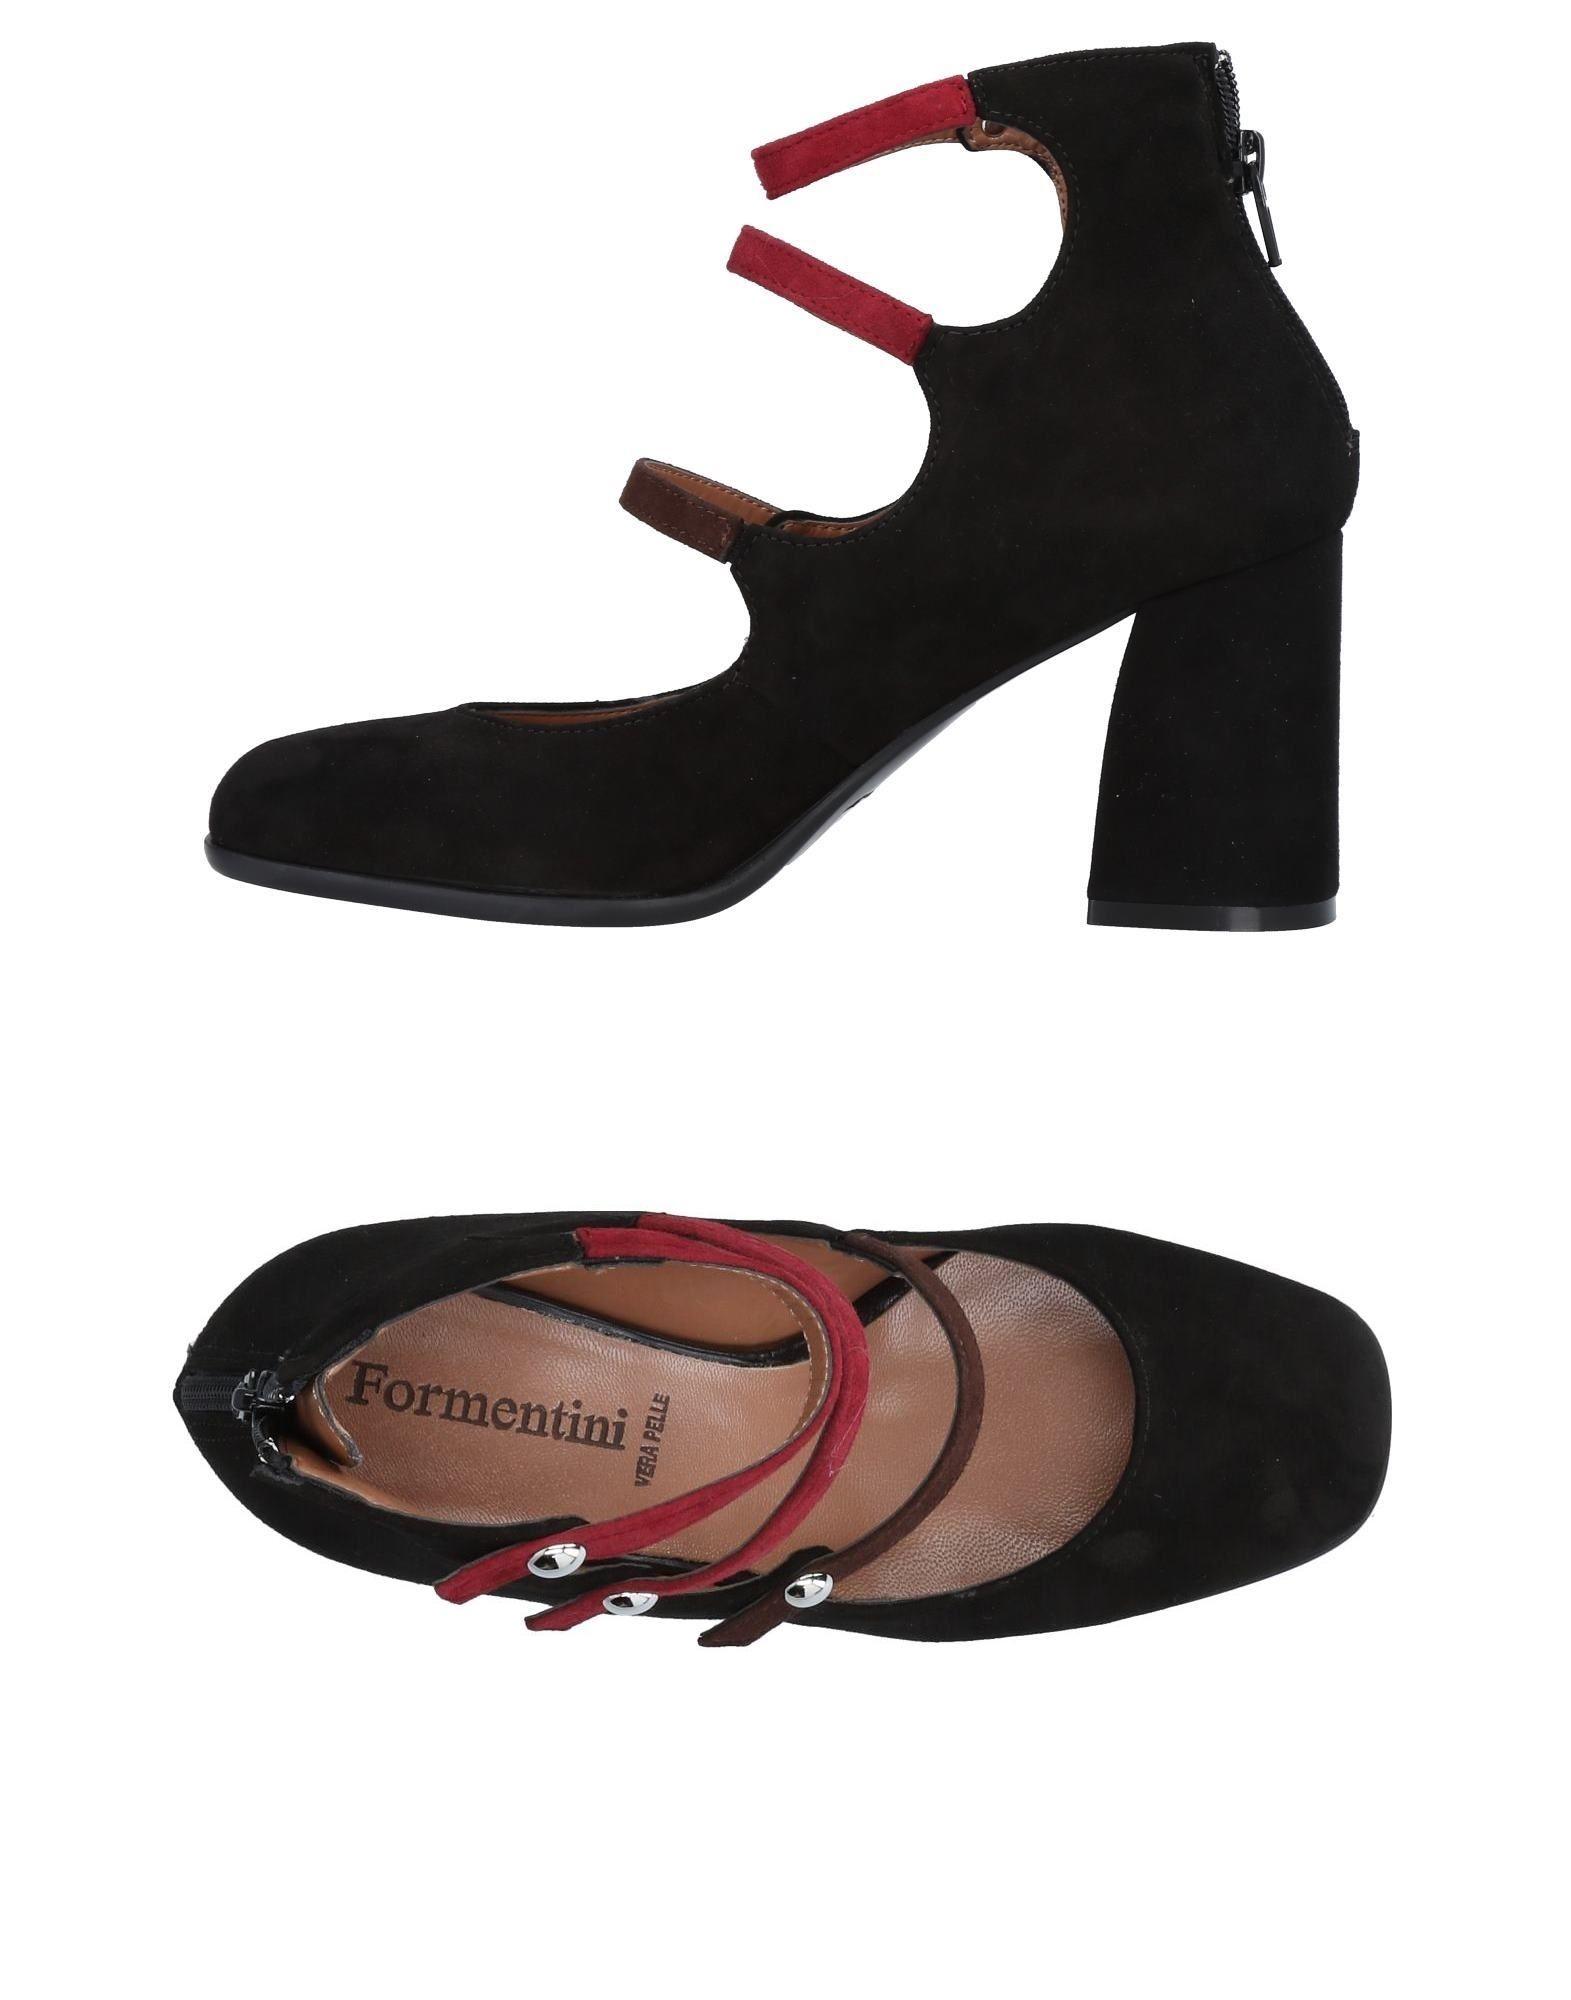 Formentini Pumps Damen beliebte  11479019WO Gute Qualität beliebte Damen Schuhe 123638